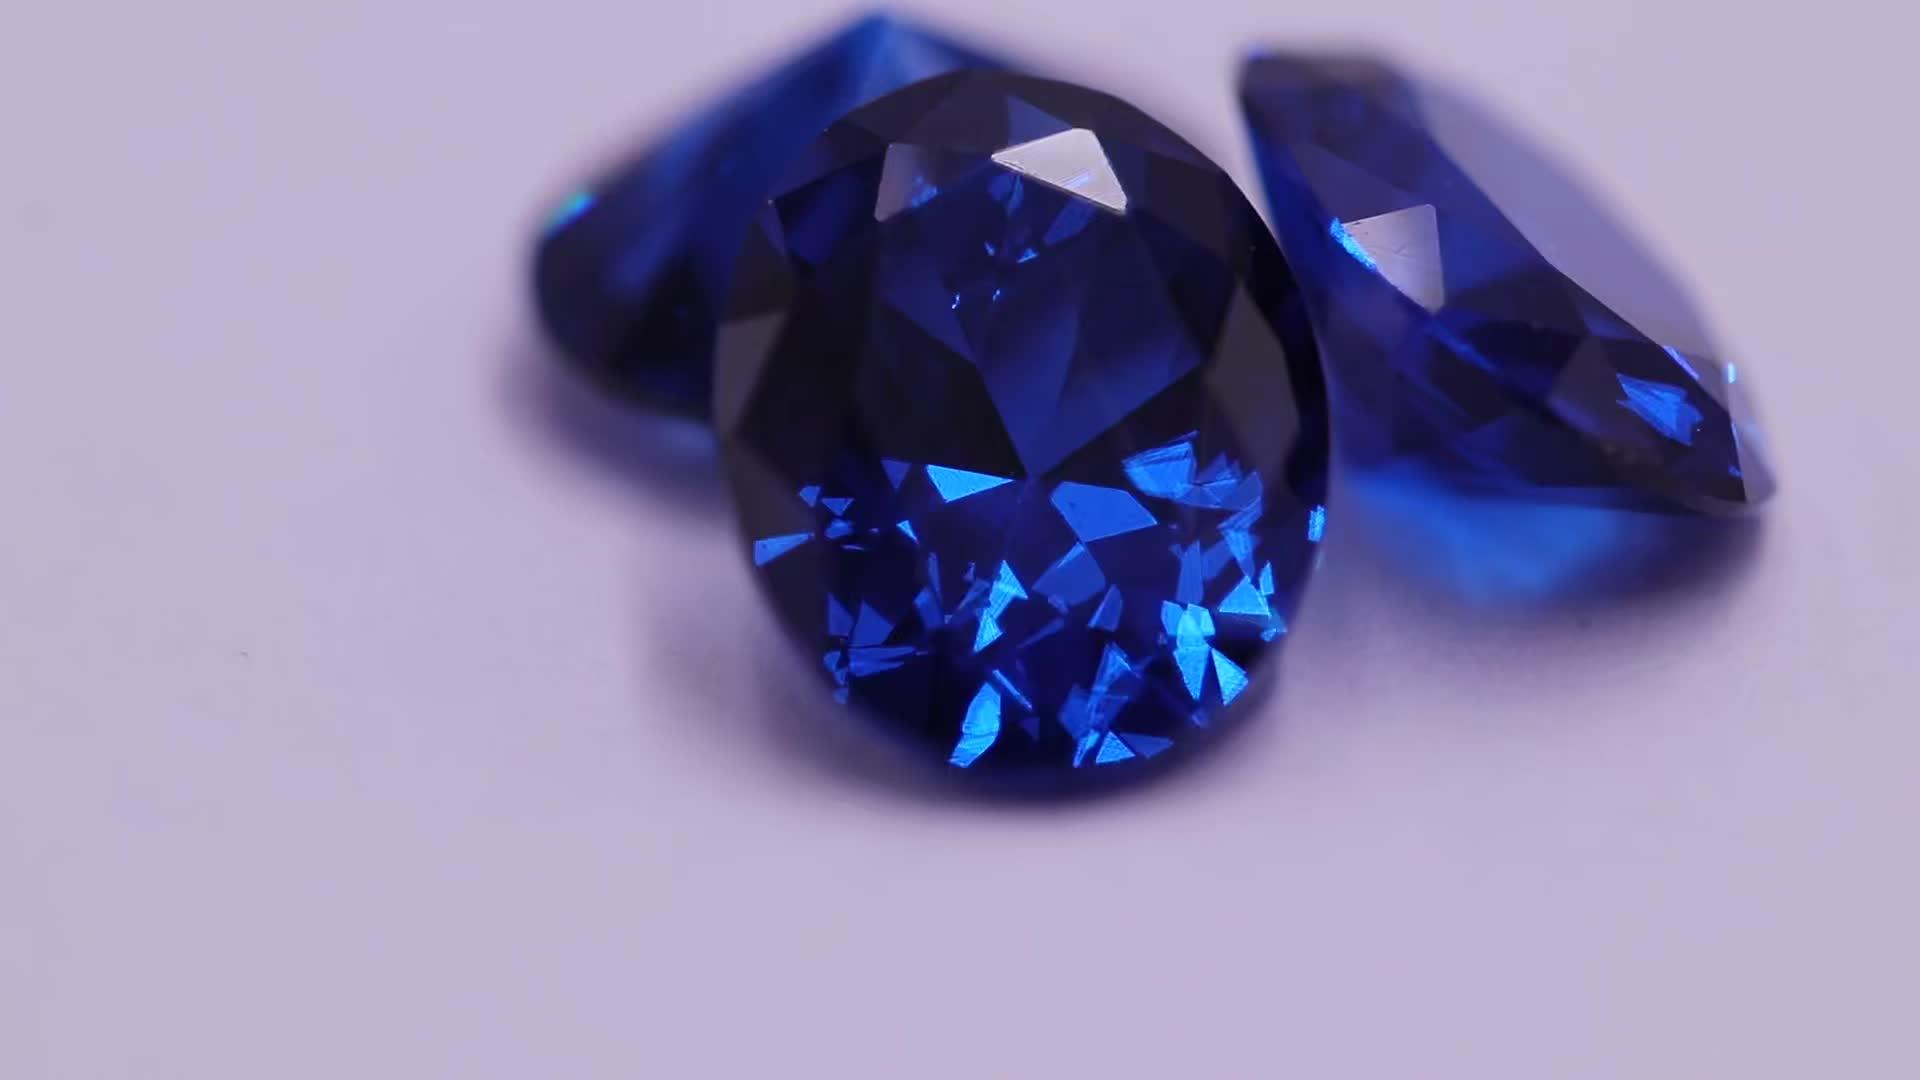 Wholesale Sapphire Blue Zircon Gemstone Oval Cut CZ Stone Synthetic Cubic Zircon Loose Gems